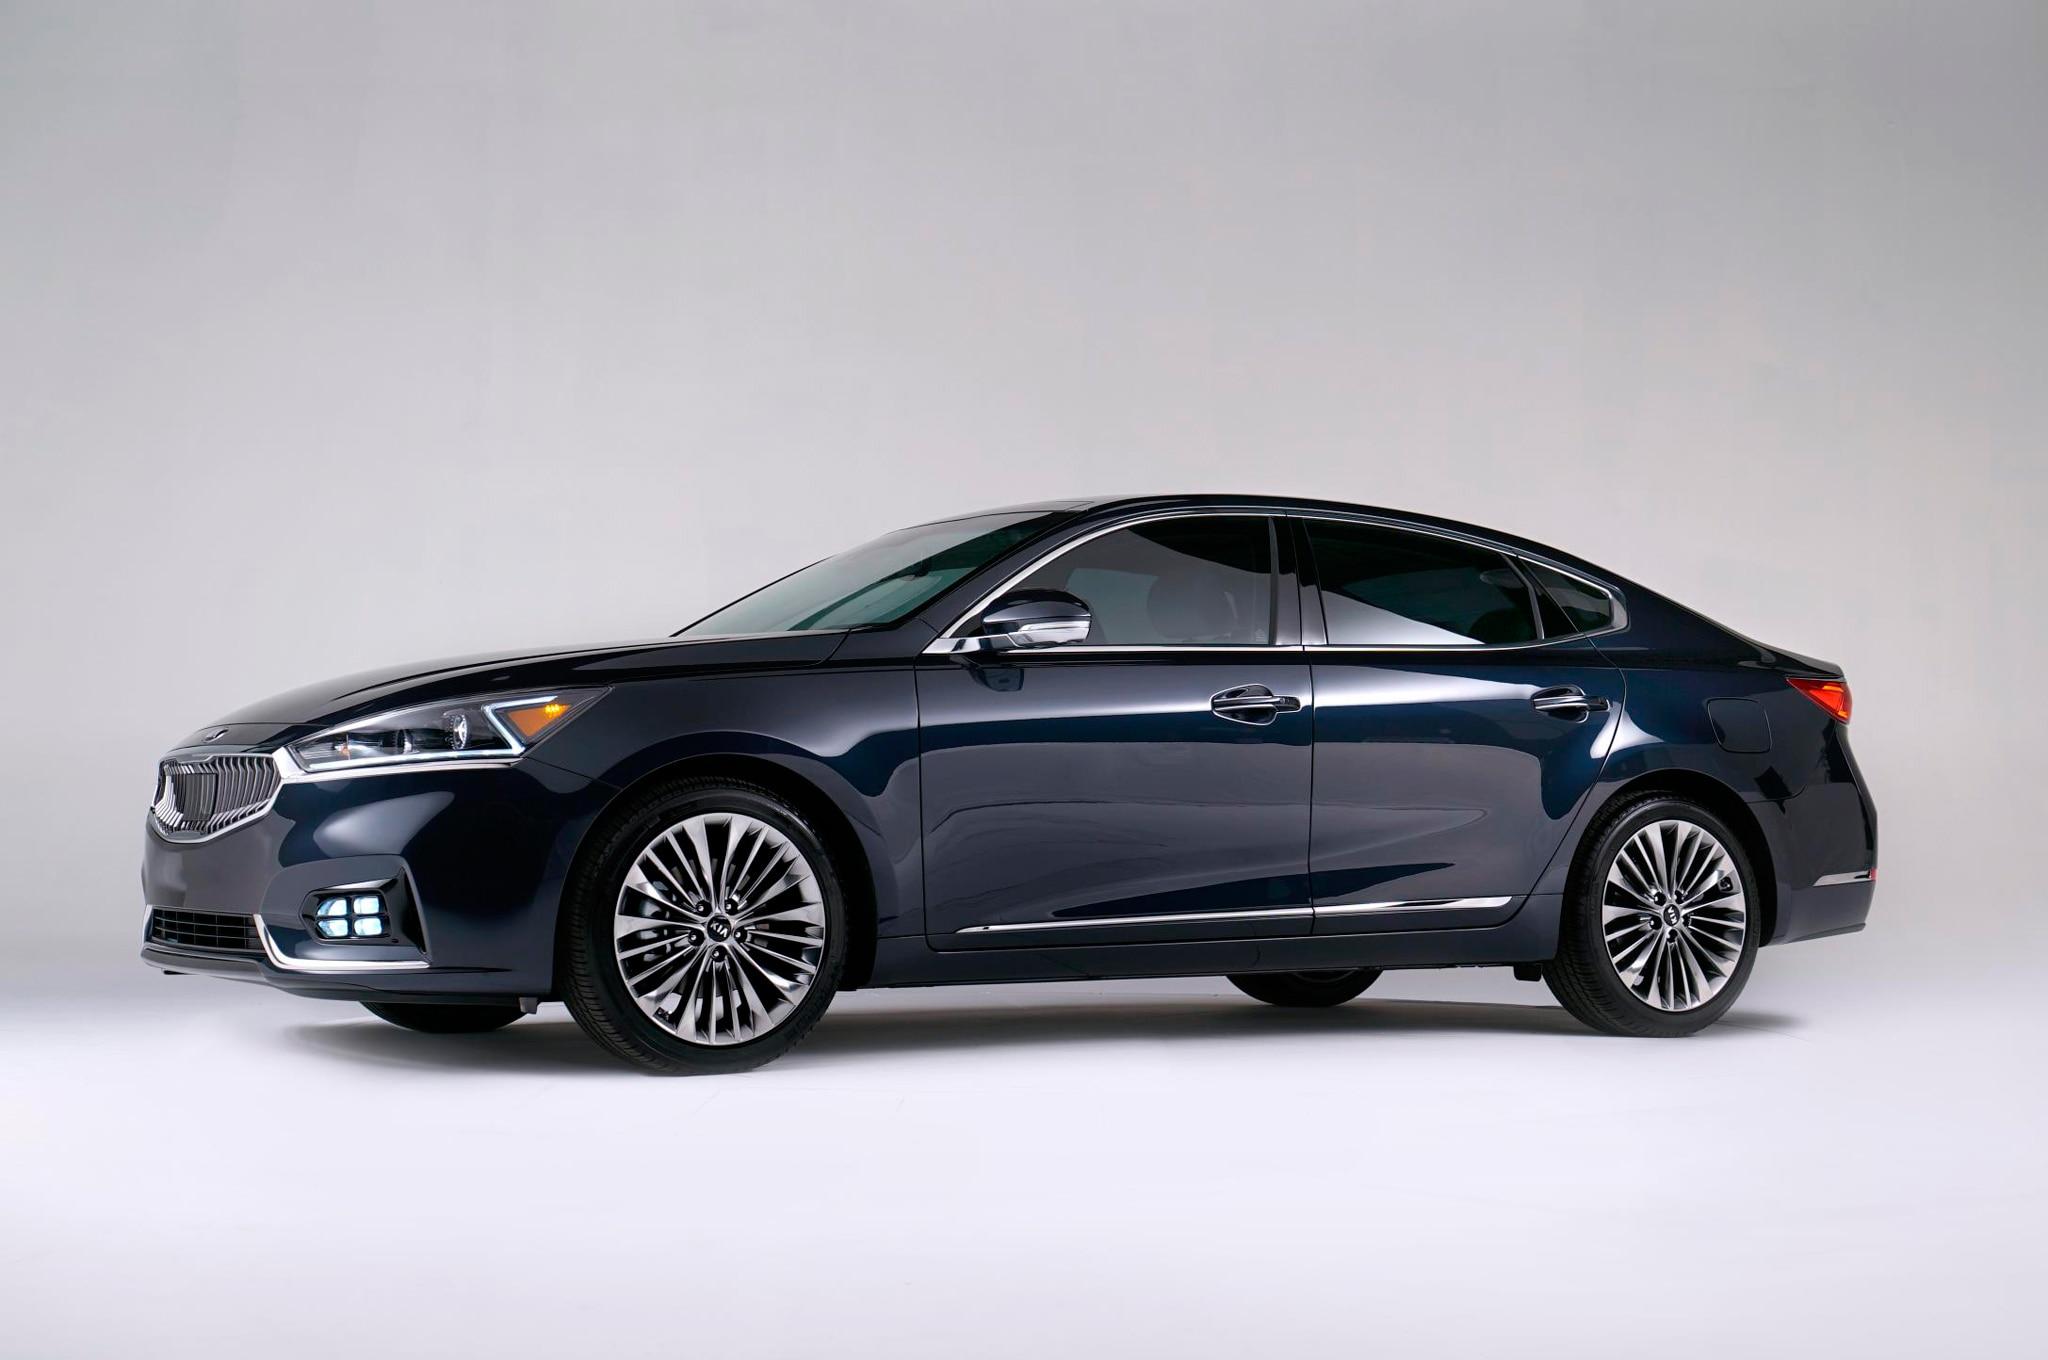 2017 Kia Cadenza Sedan Bows In New York Automobile Magazine